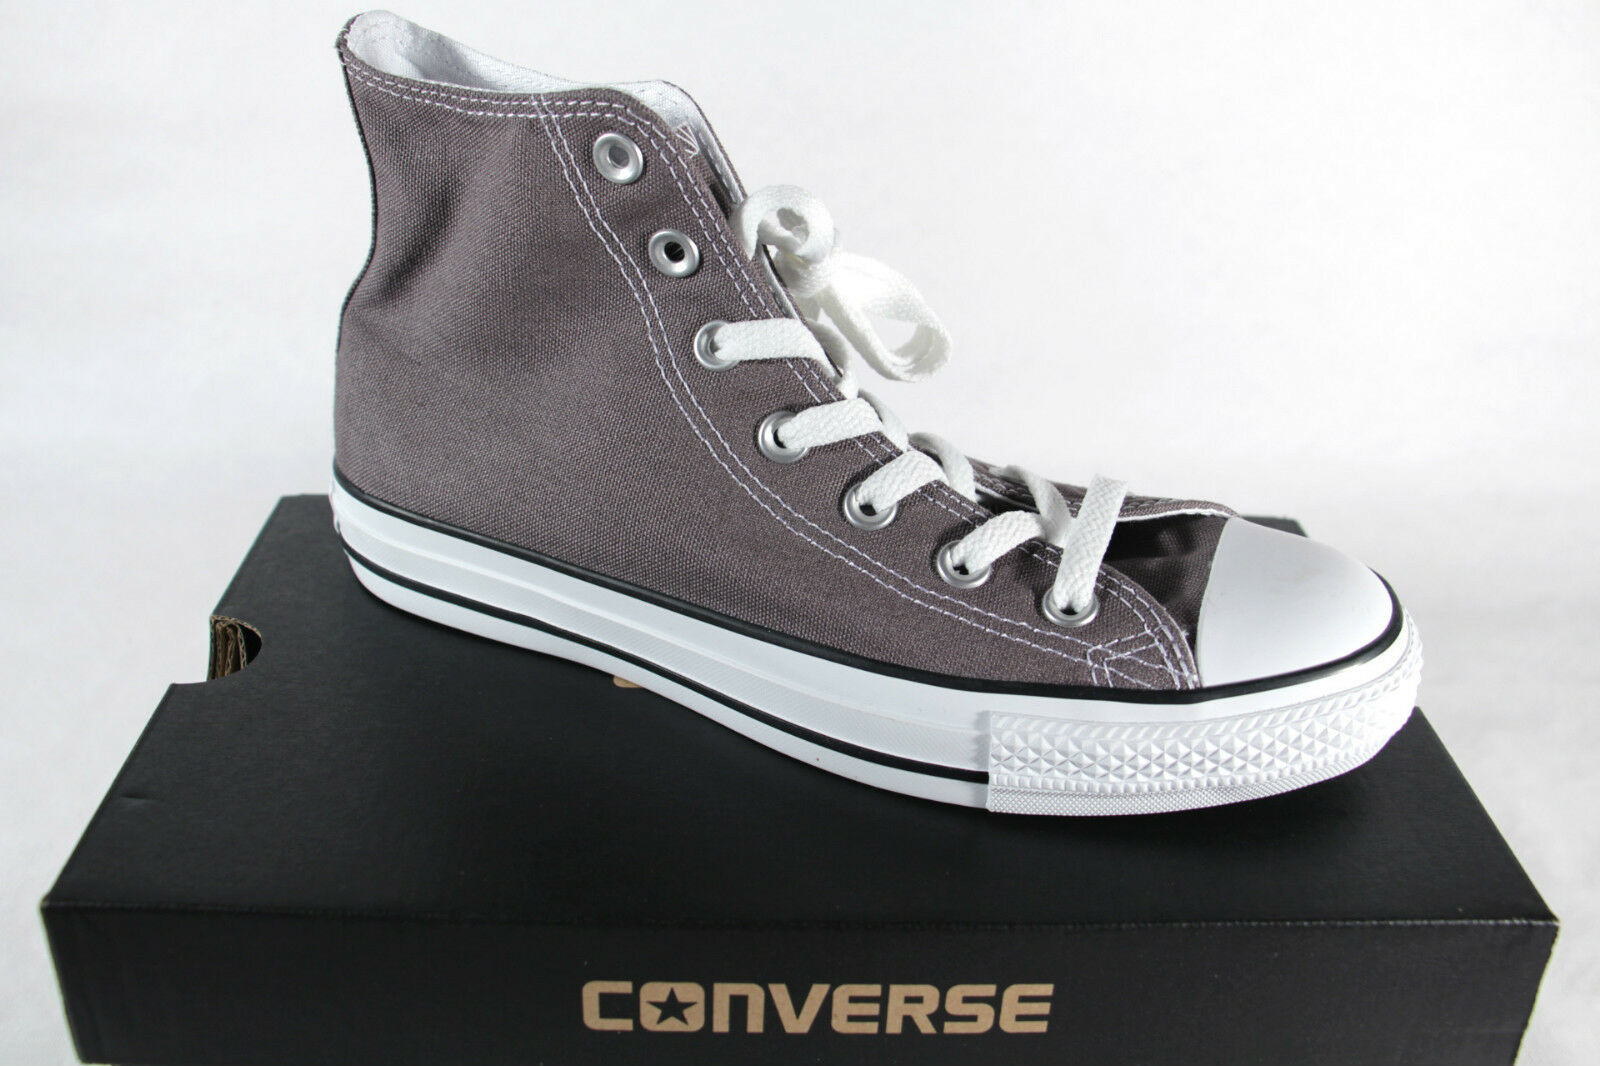 Converse All Star Stiefel, grau, Textil  Leinen, Neu